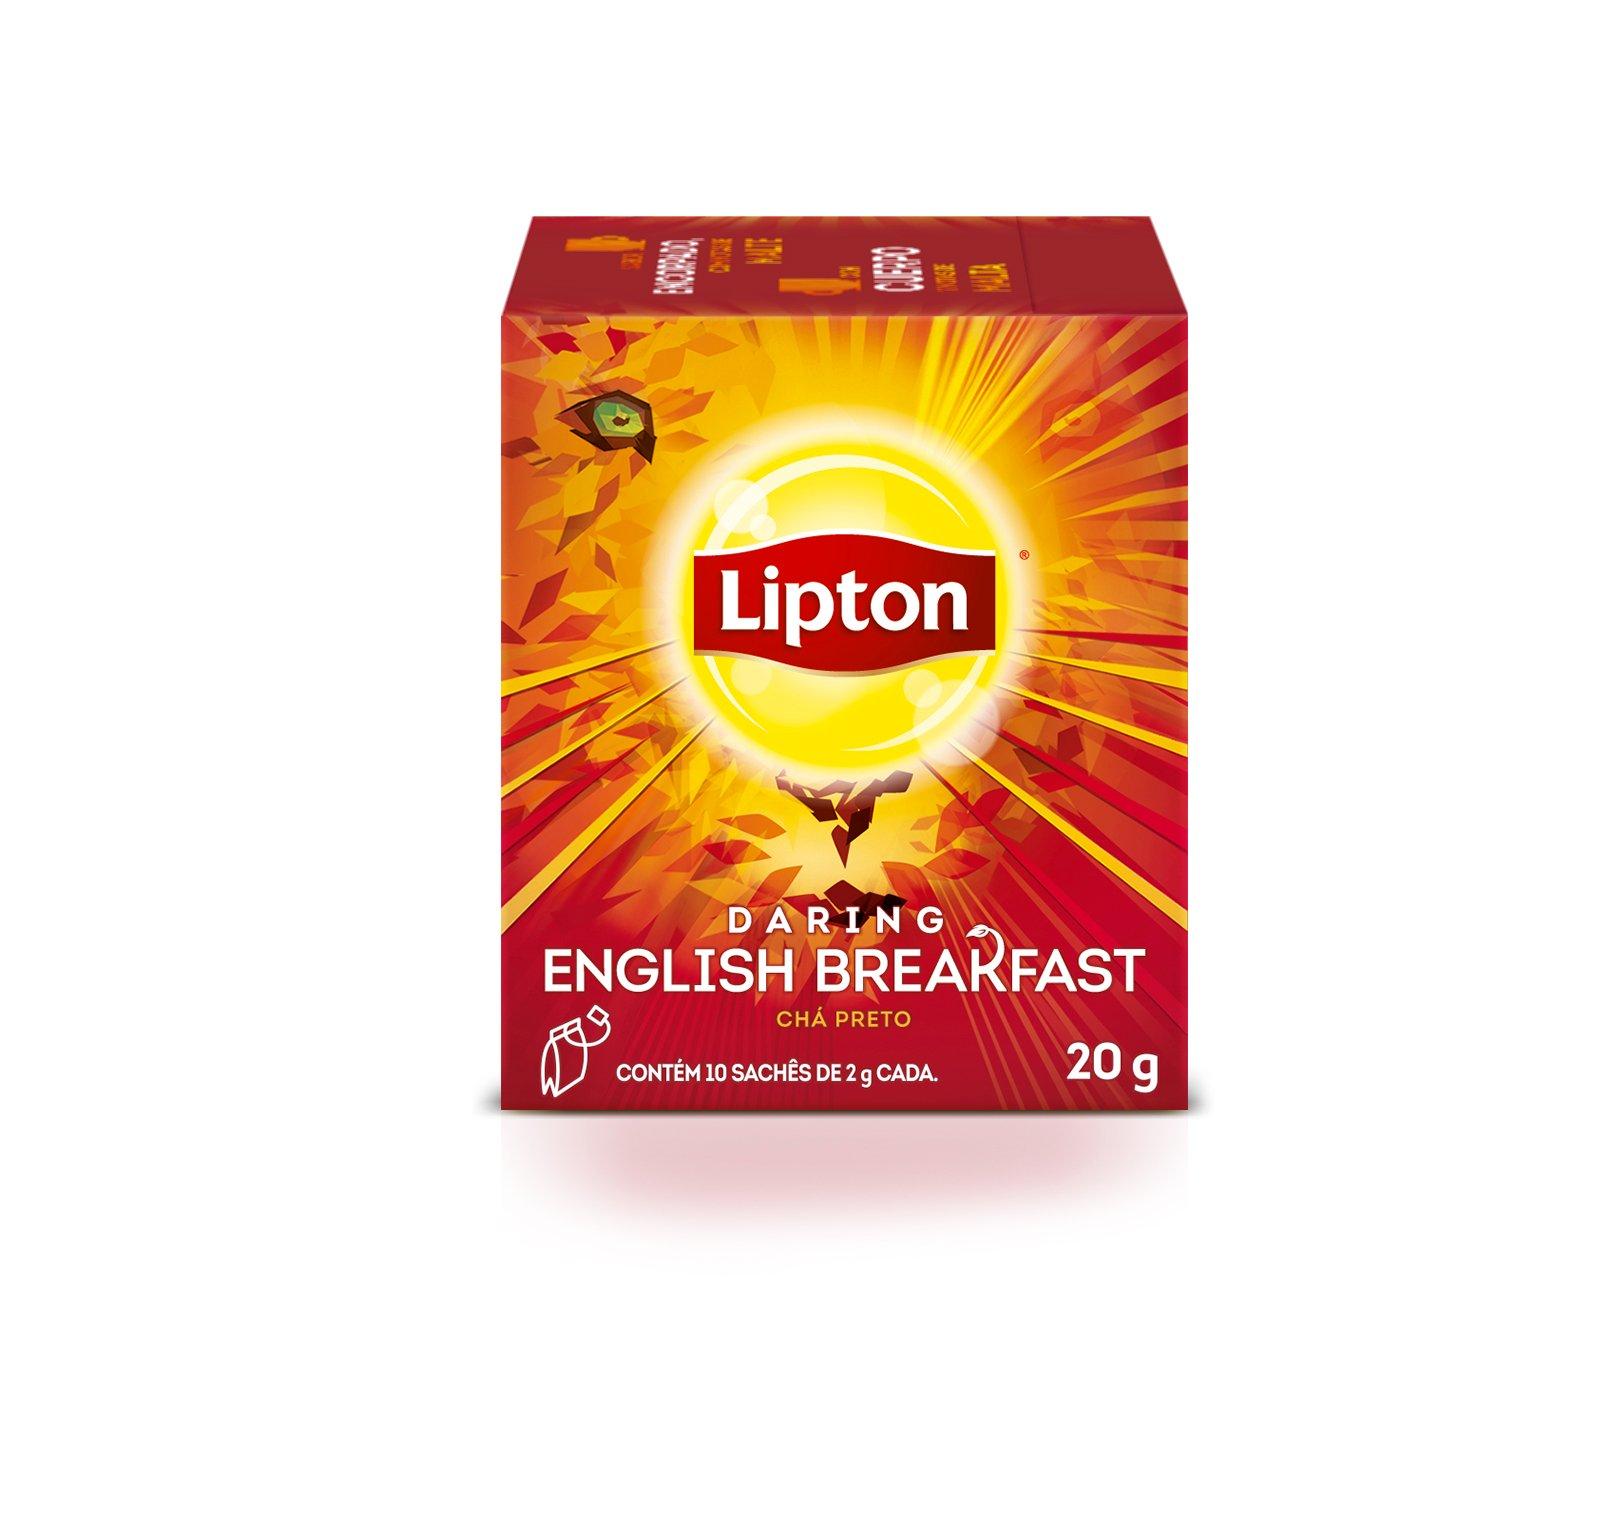 Chá Preto Lipton - English Breakfast -